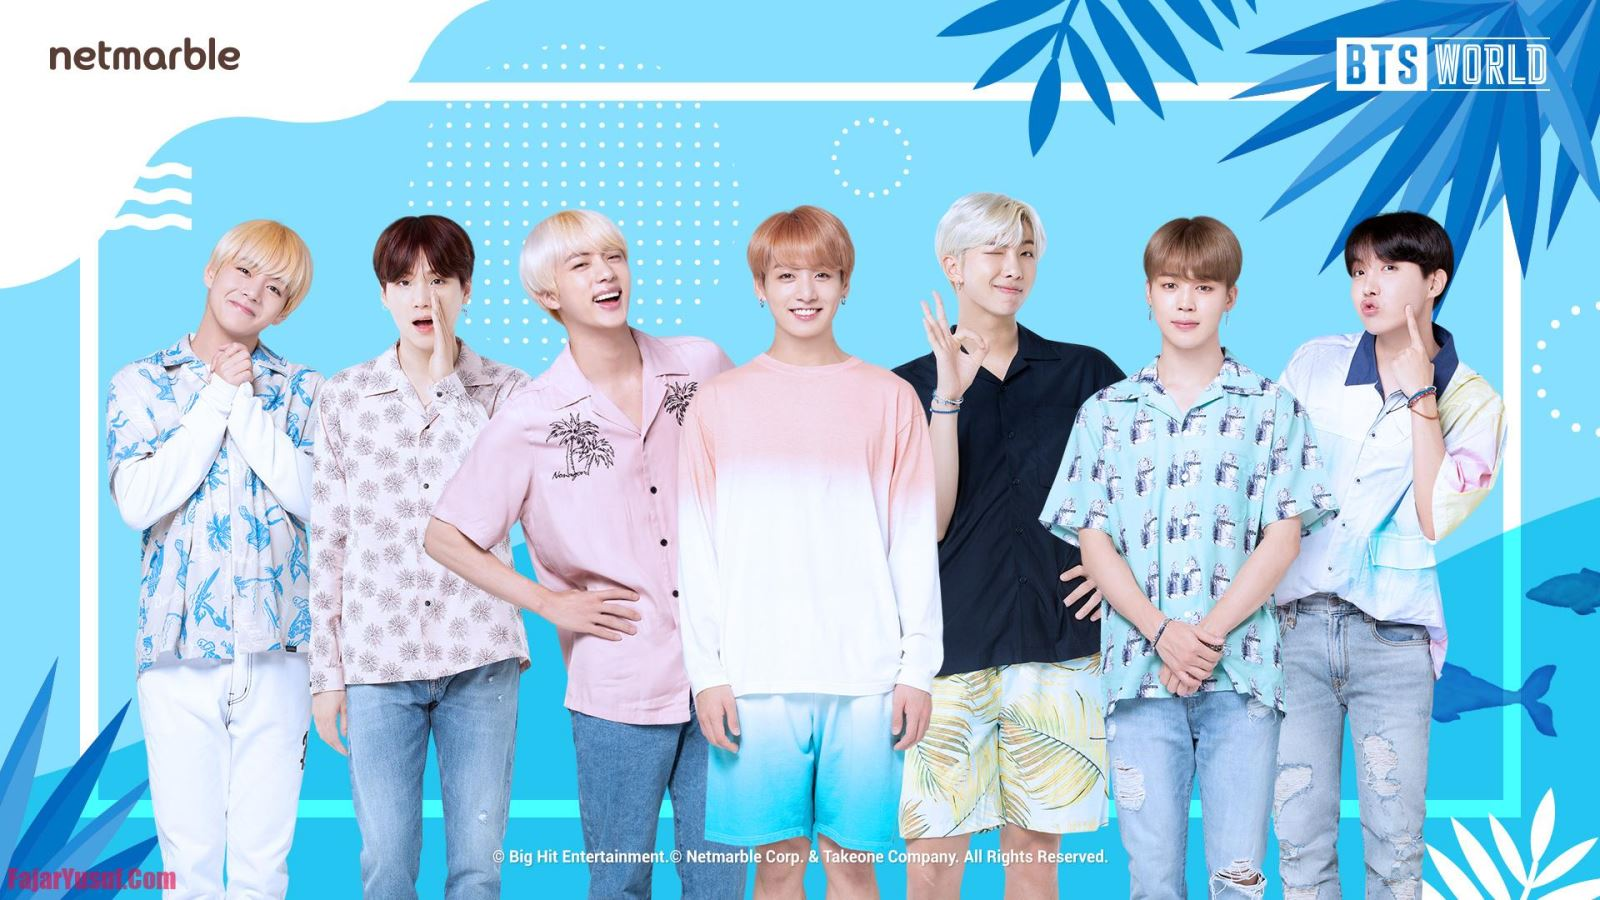 BTS, BTS lập kỷ lục Billboard, thành tích mới của BTS, album của BTS, bxh Billboard200, Album Love Yourself Answer của BTS bám trụ Billboard suốt 50 tuần liên tiếp